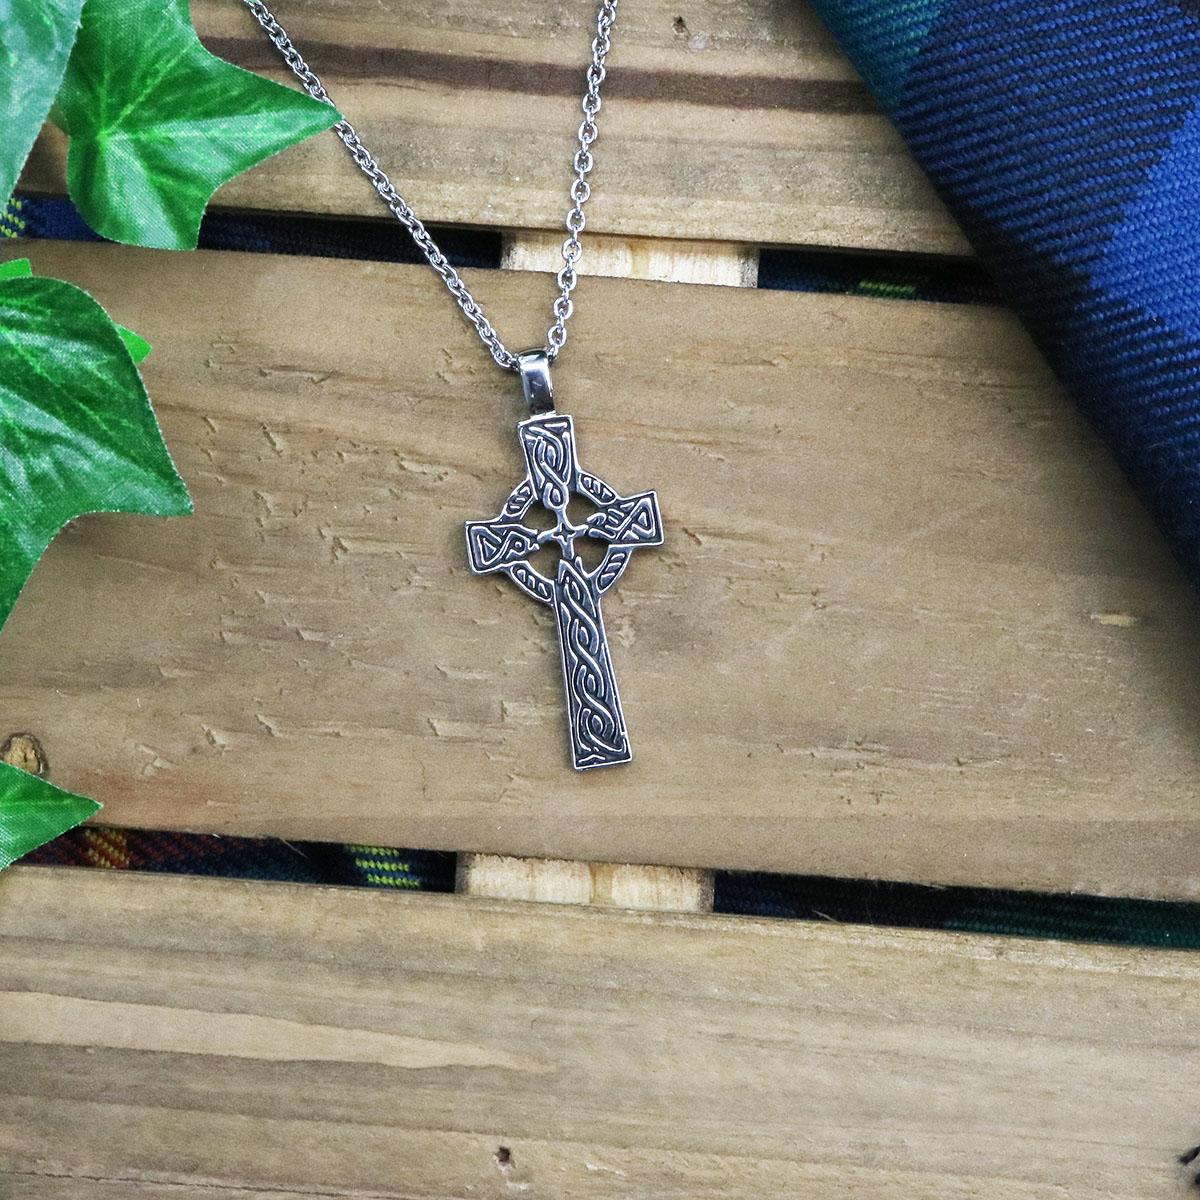 Cross necklace pendant